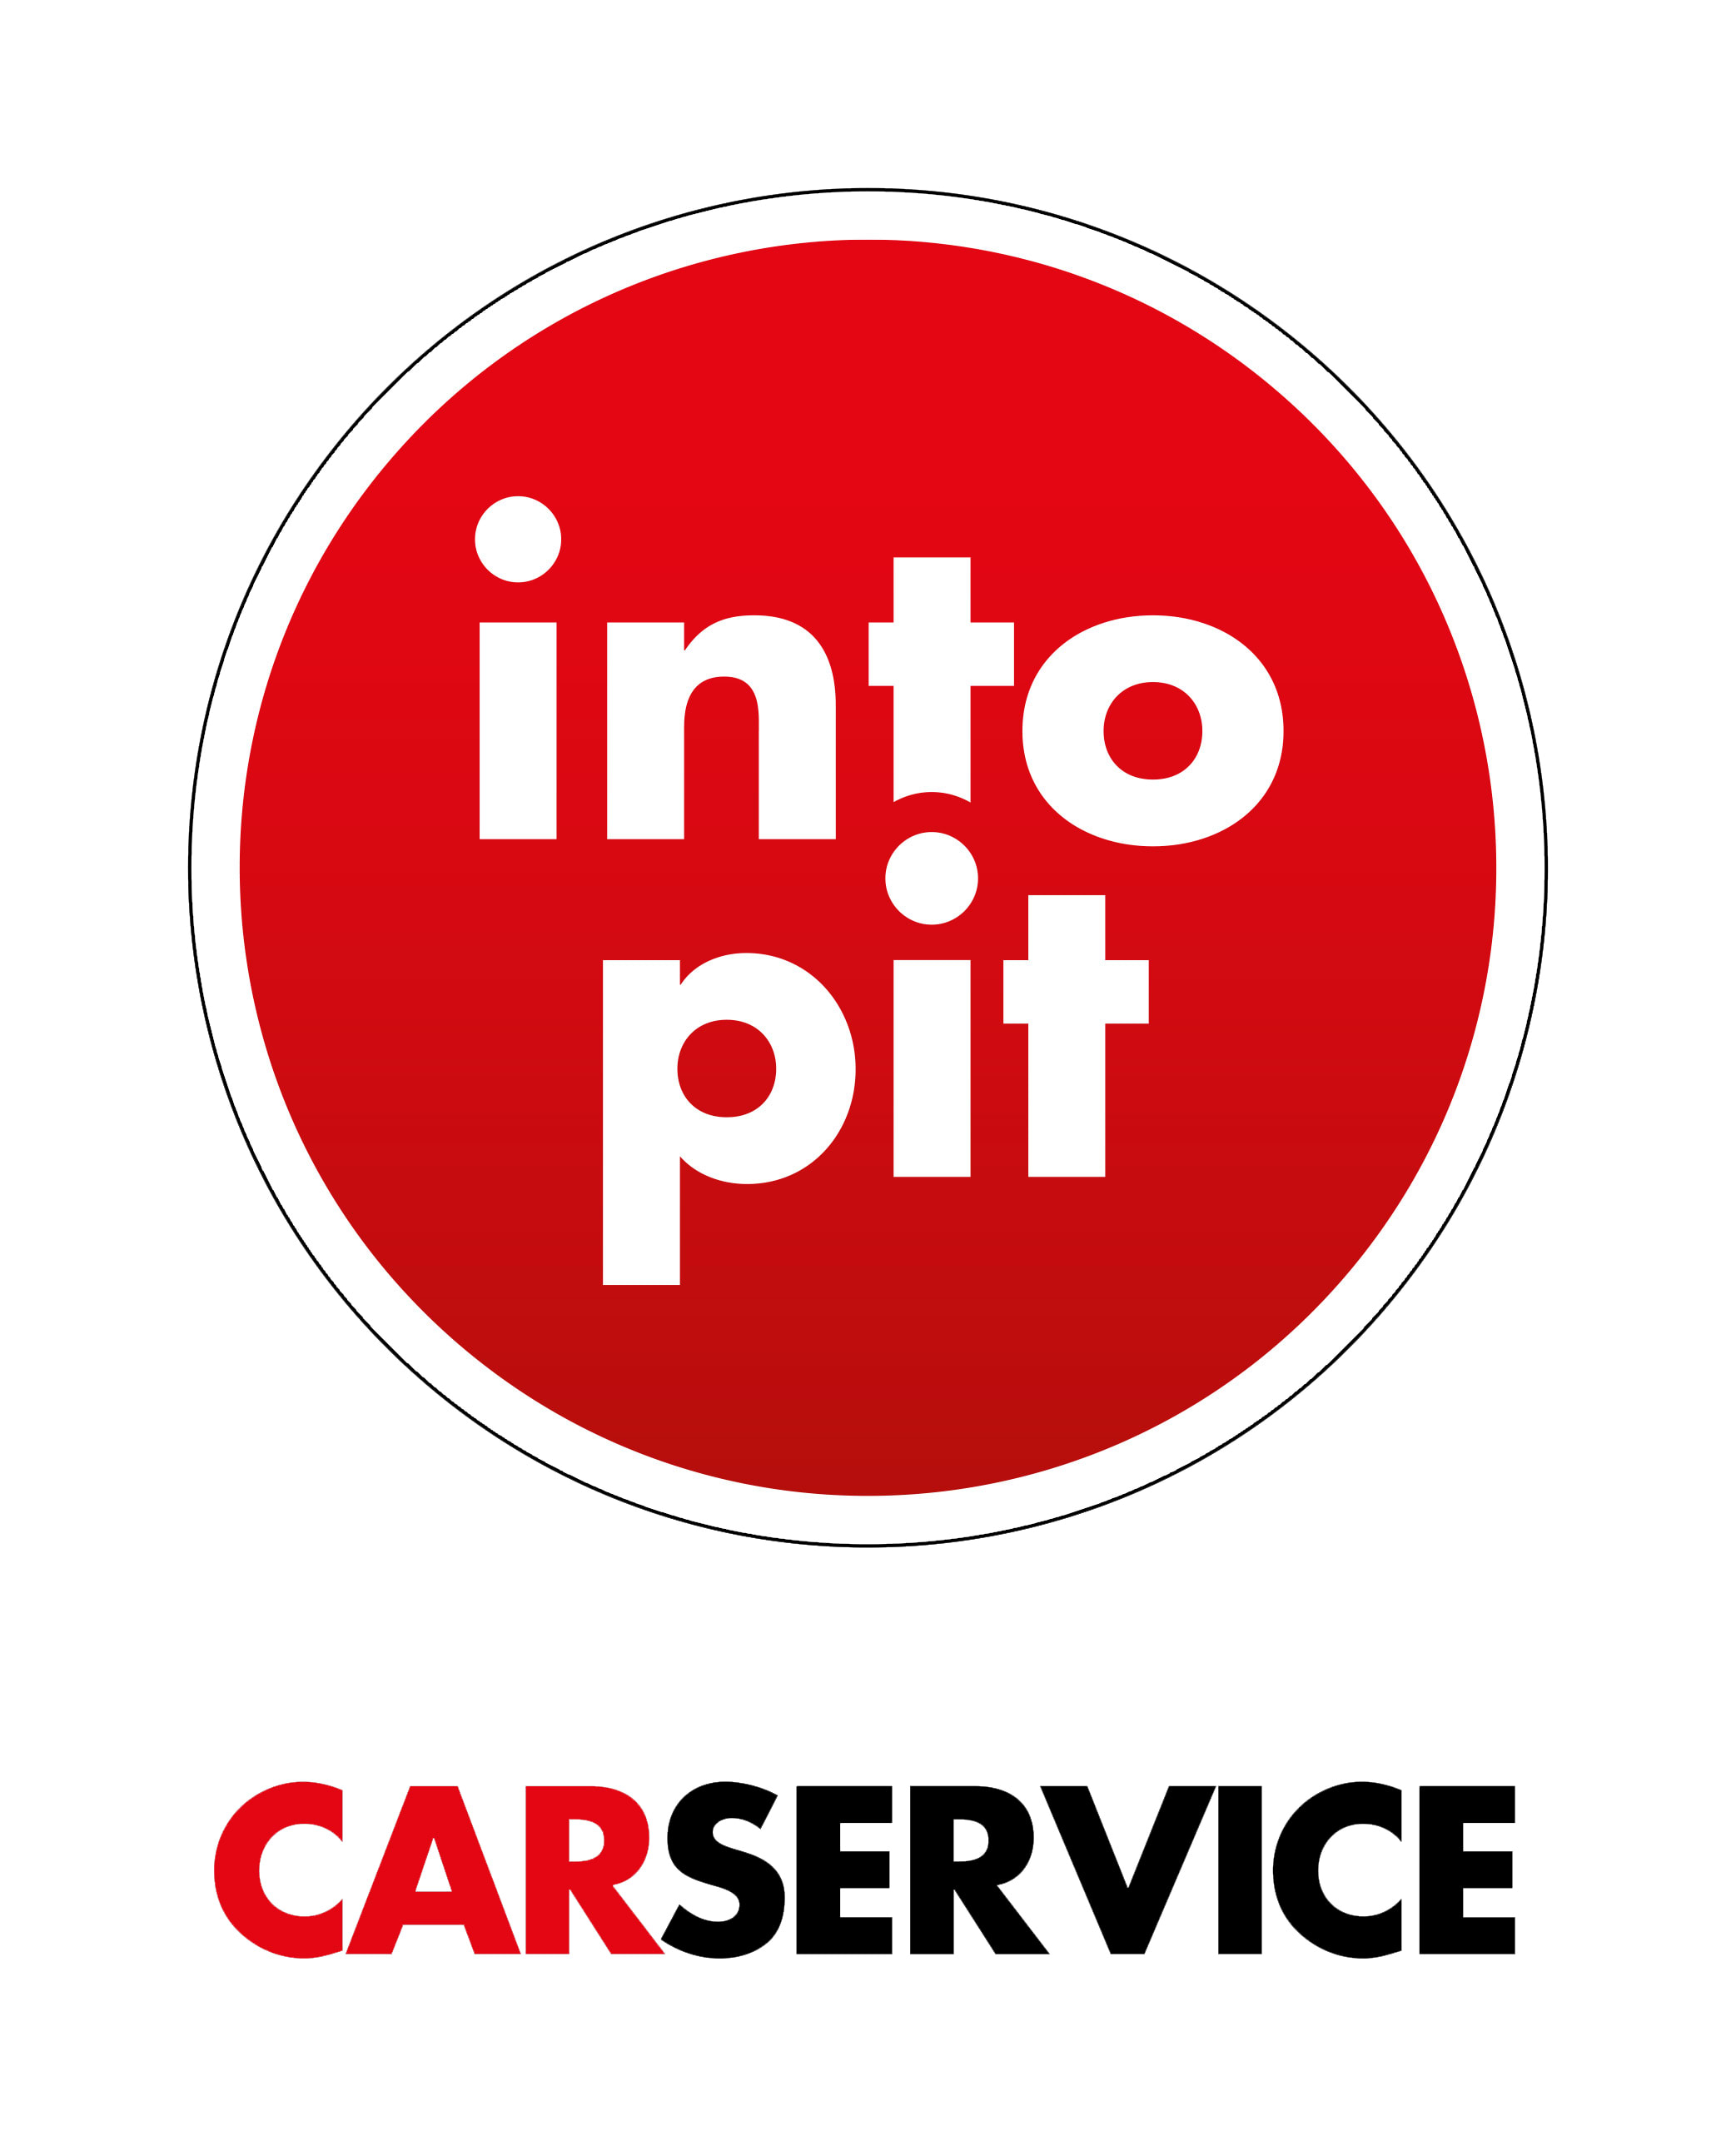 Intopit Carservice - Vest logo